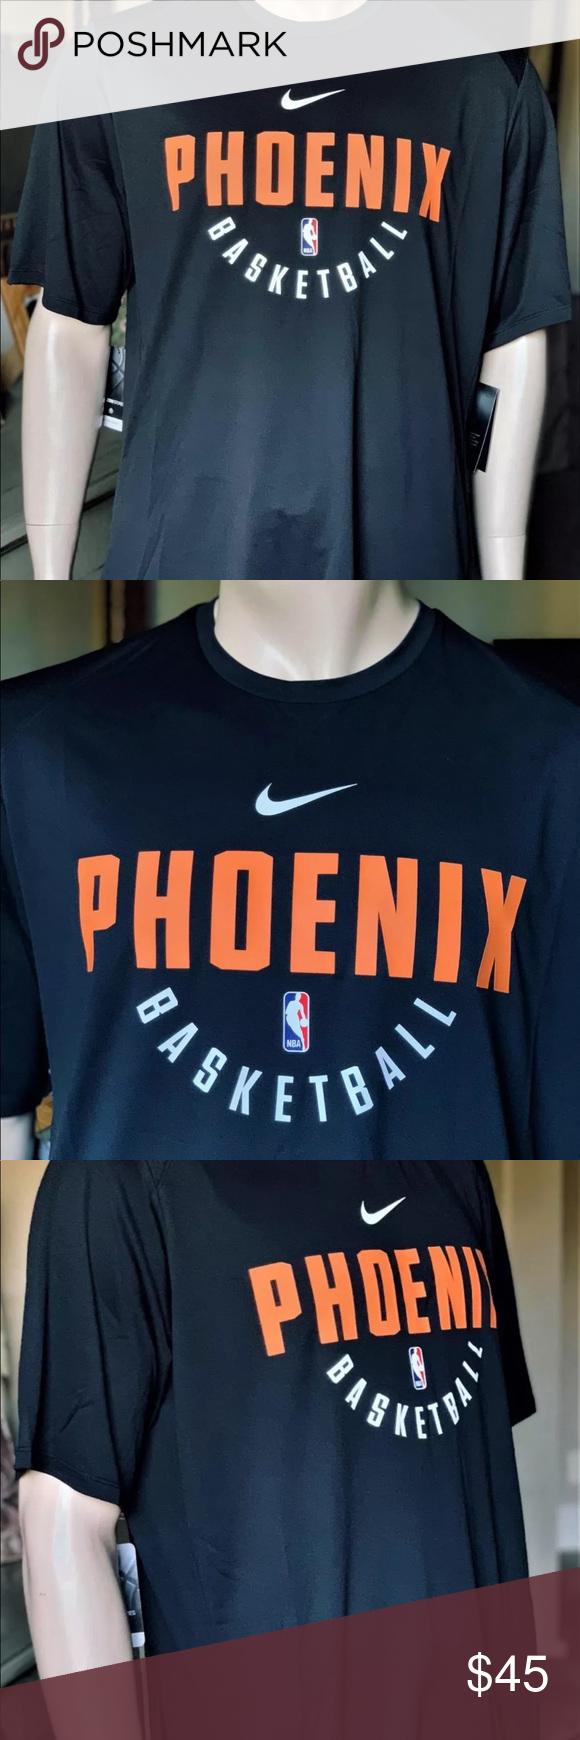 170d3d1a Men's Nike NBA Phoenix Suns Shooting Shirt NIKE NBA OFFICIAL PHOENIX SUNS  BASKETBALL PRACTICE SHOOTING SHIRT